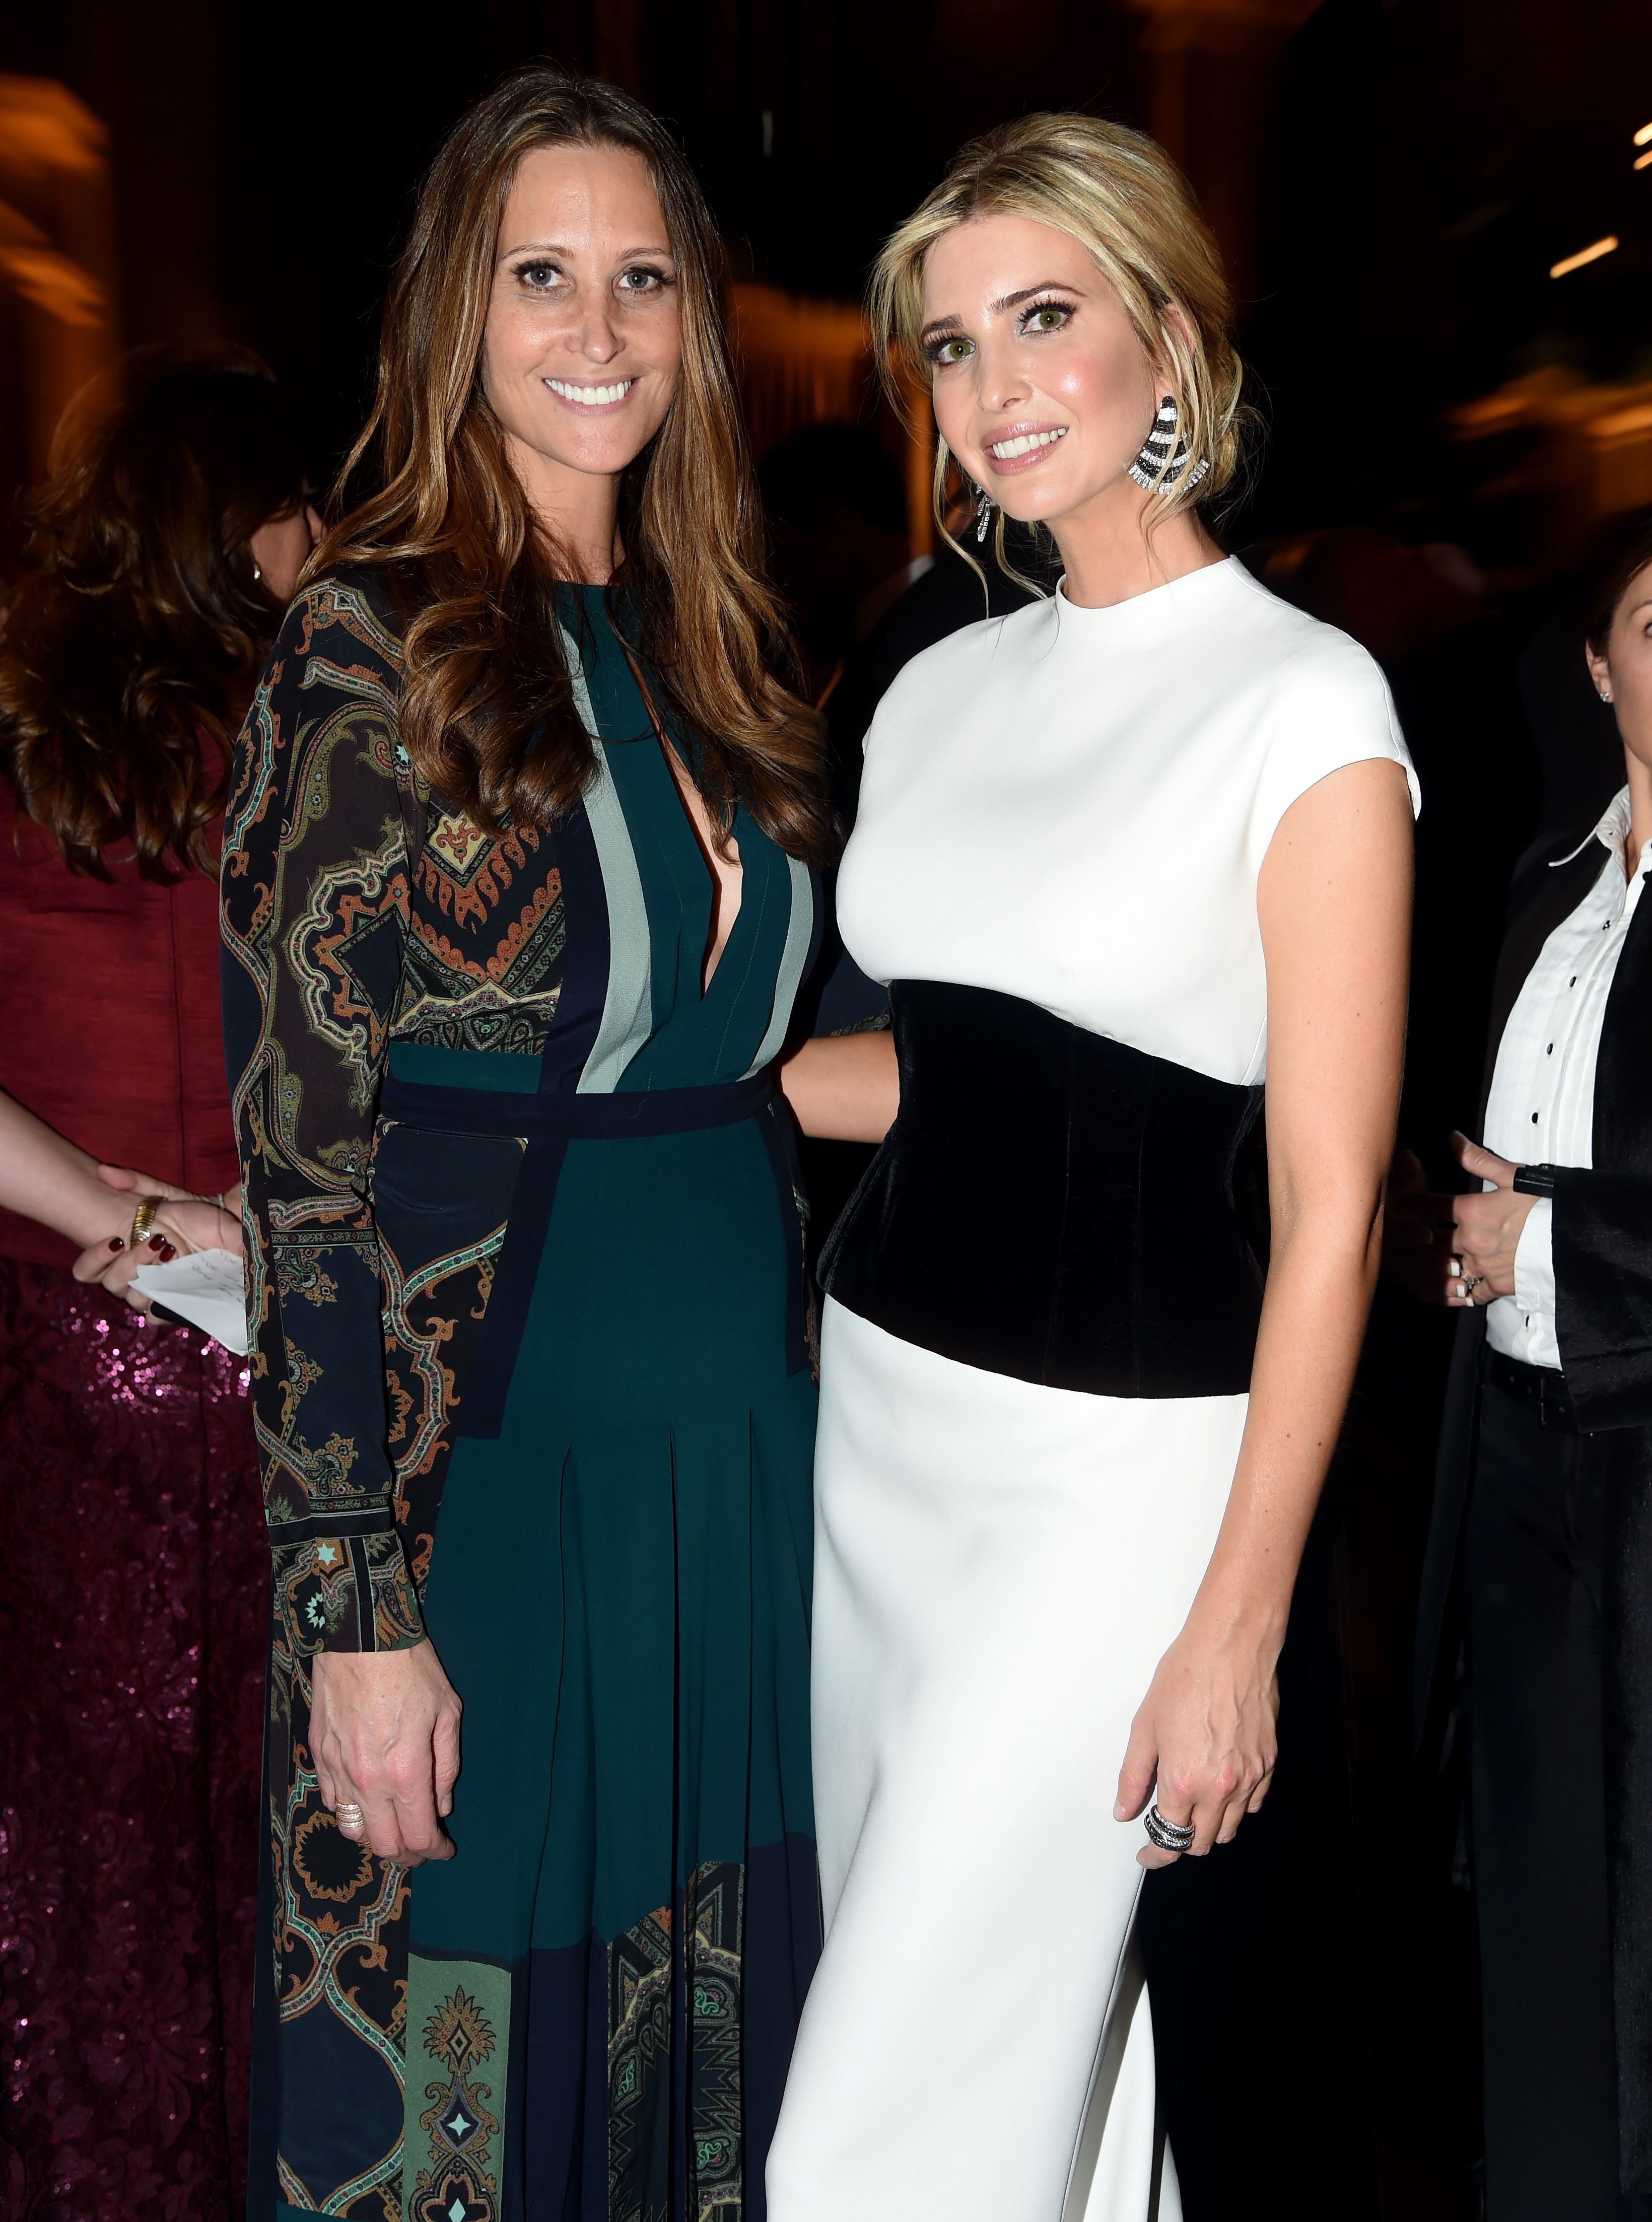 Stephanie Winston Wolkoff and Ivanka Trump